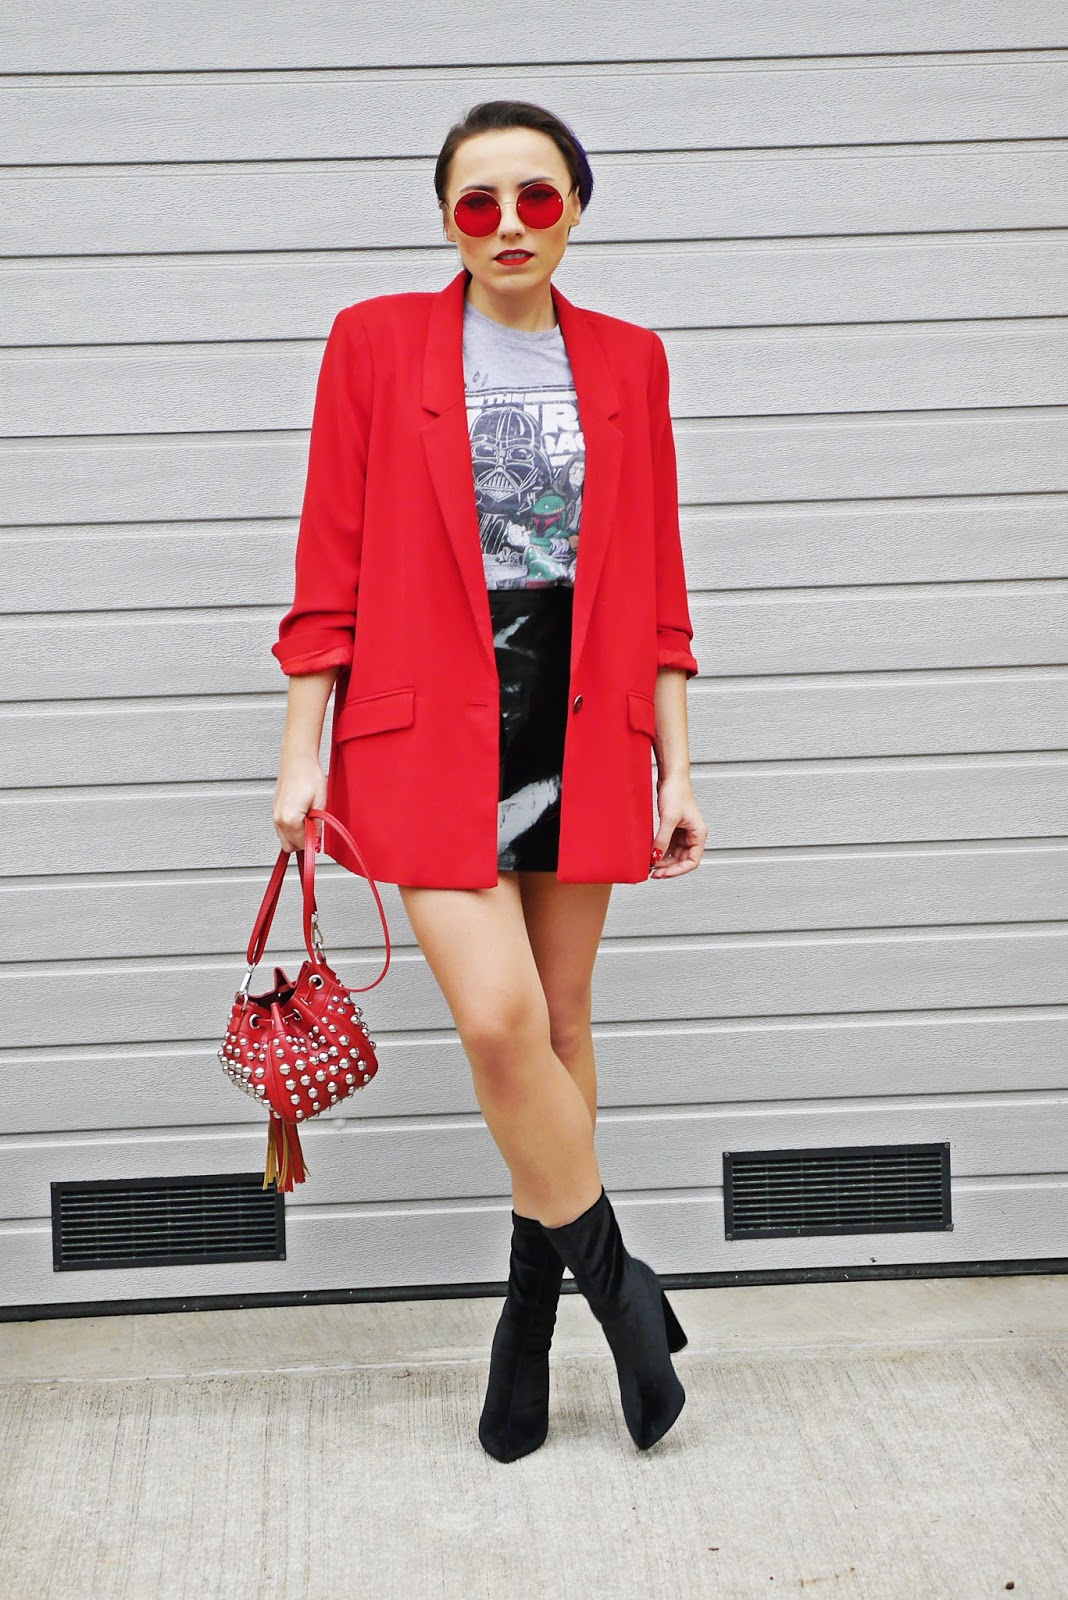 8_blog_modowy_pulawy_blogerka_modowa_karyn_301117